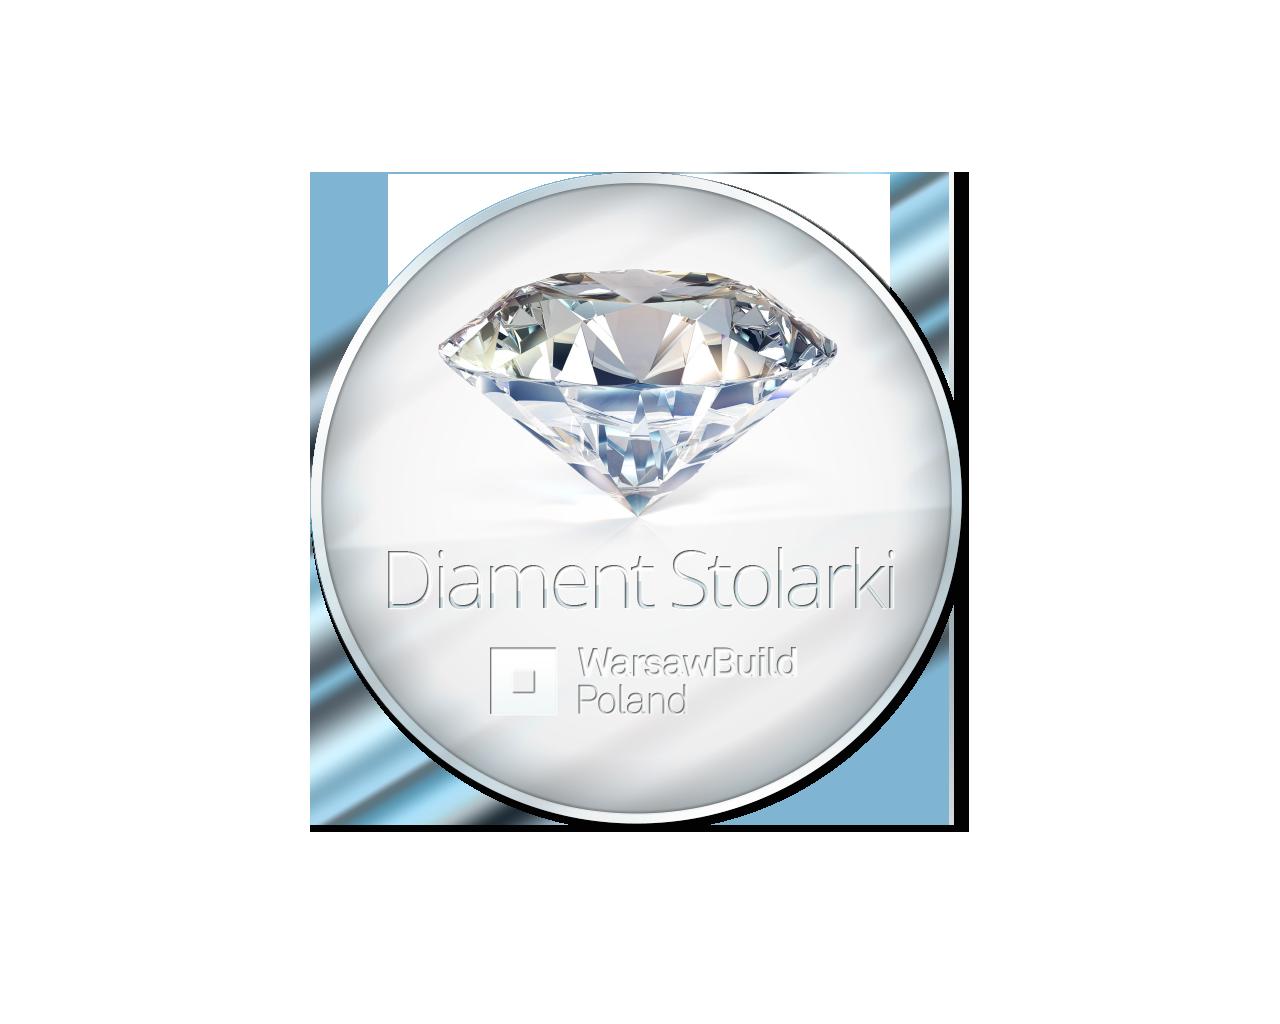 zdj. diament stolarki 2016